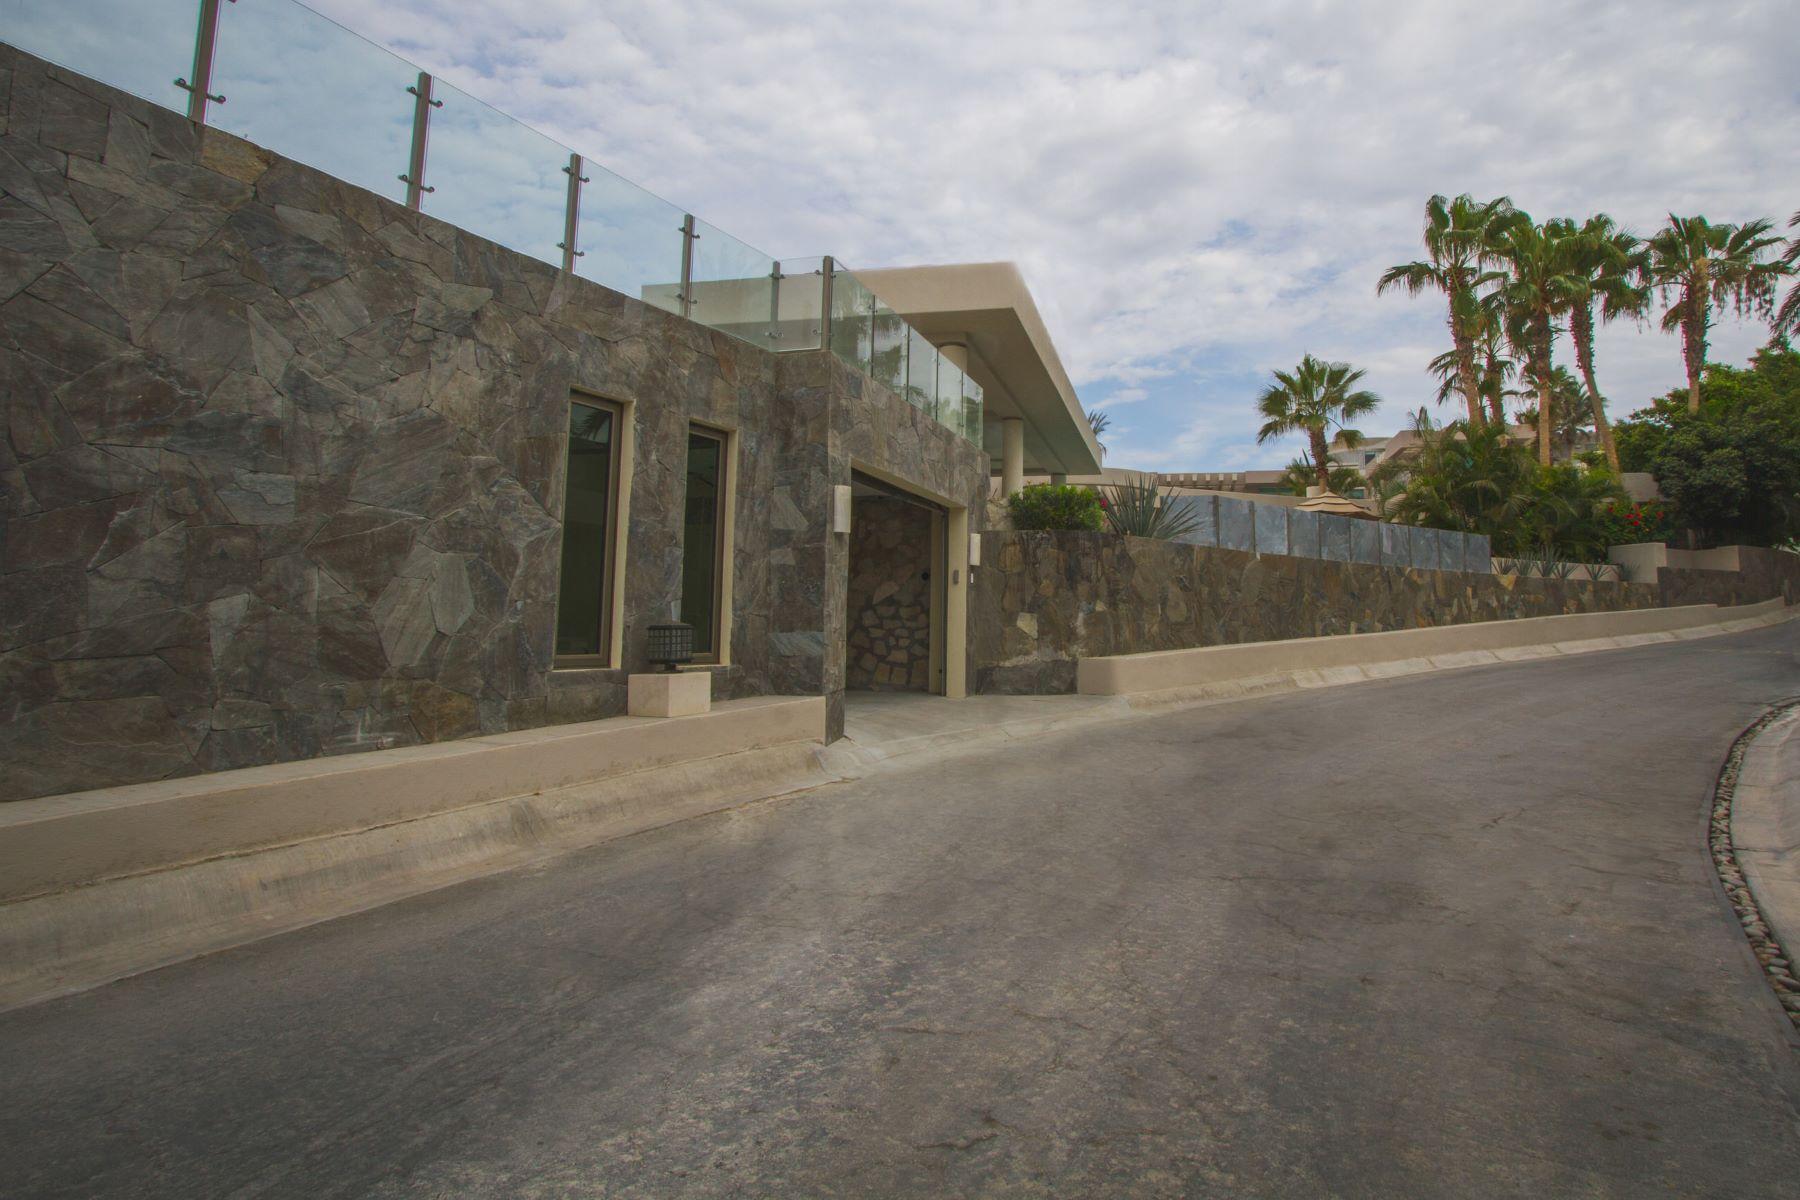 Additional photo for property listing at Villa Stephanie Villa 6 KM 18.5 Other Baja California Sur, Baja California Sur 23405 México